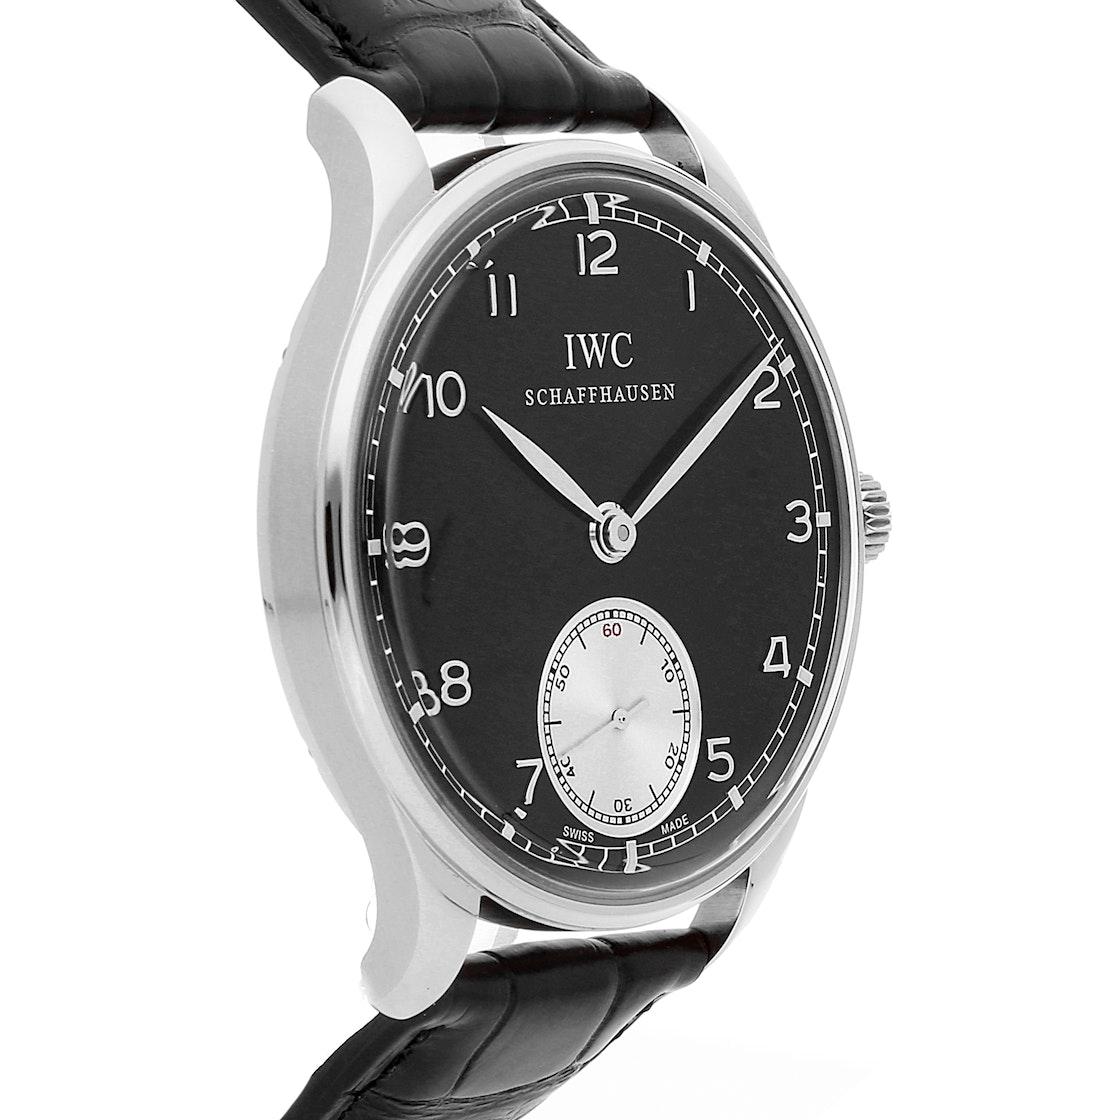 IWC Portugieser Hand-Wound IW5454-04